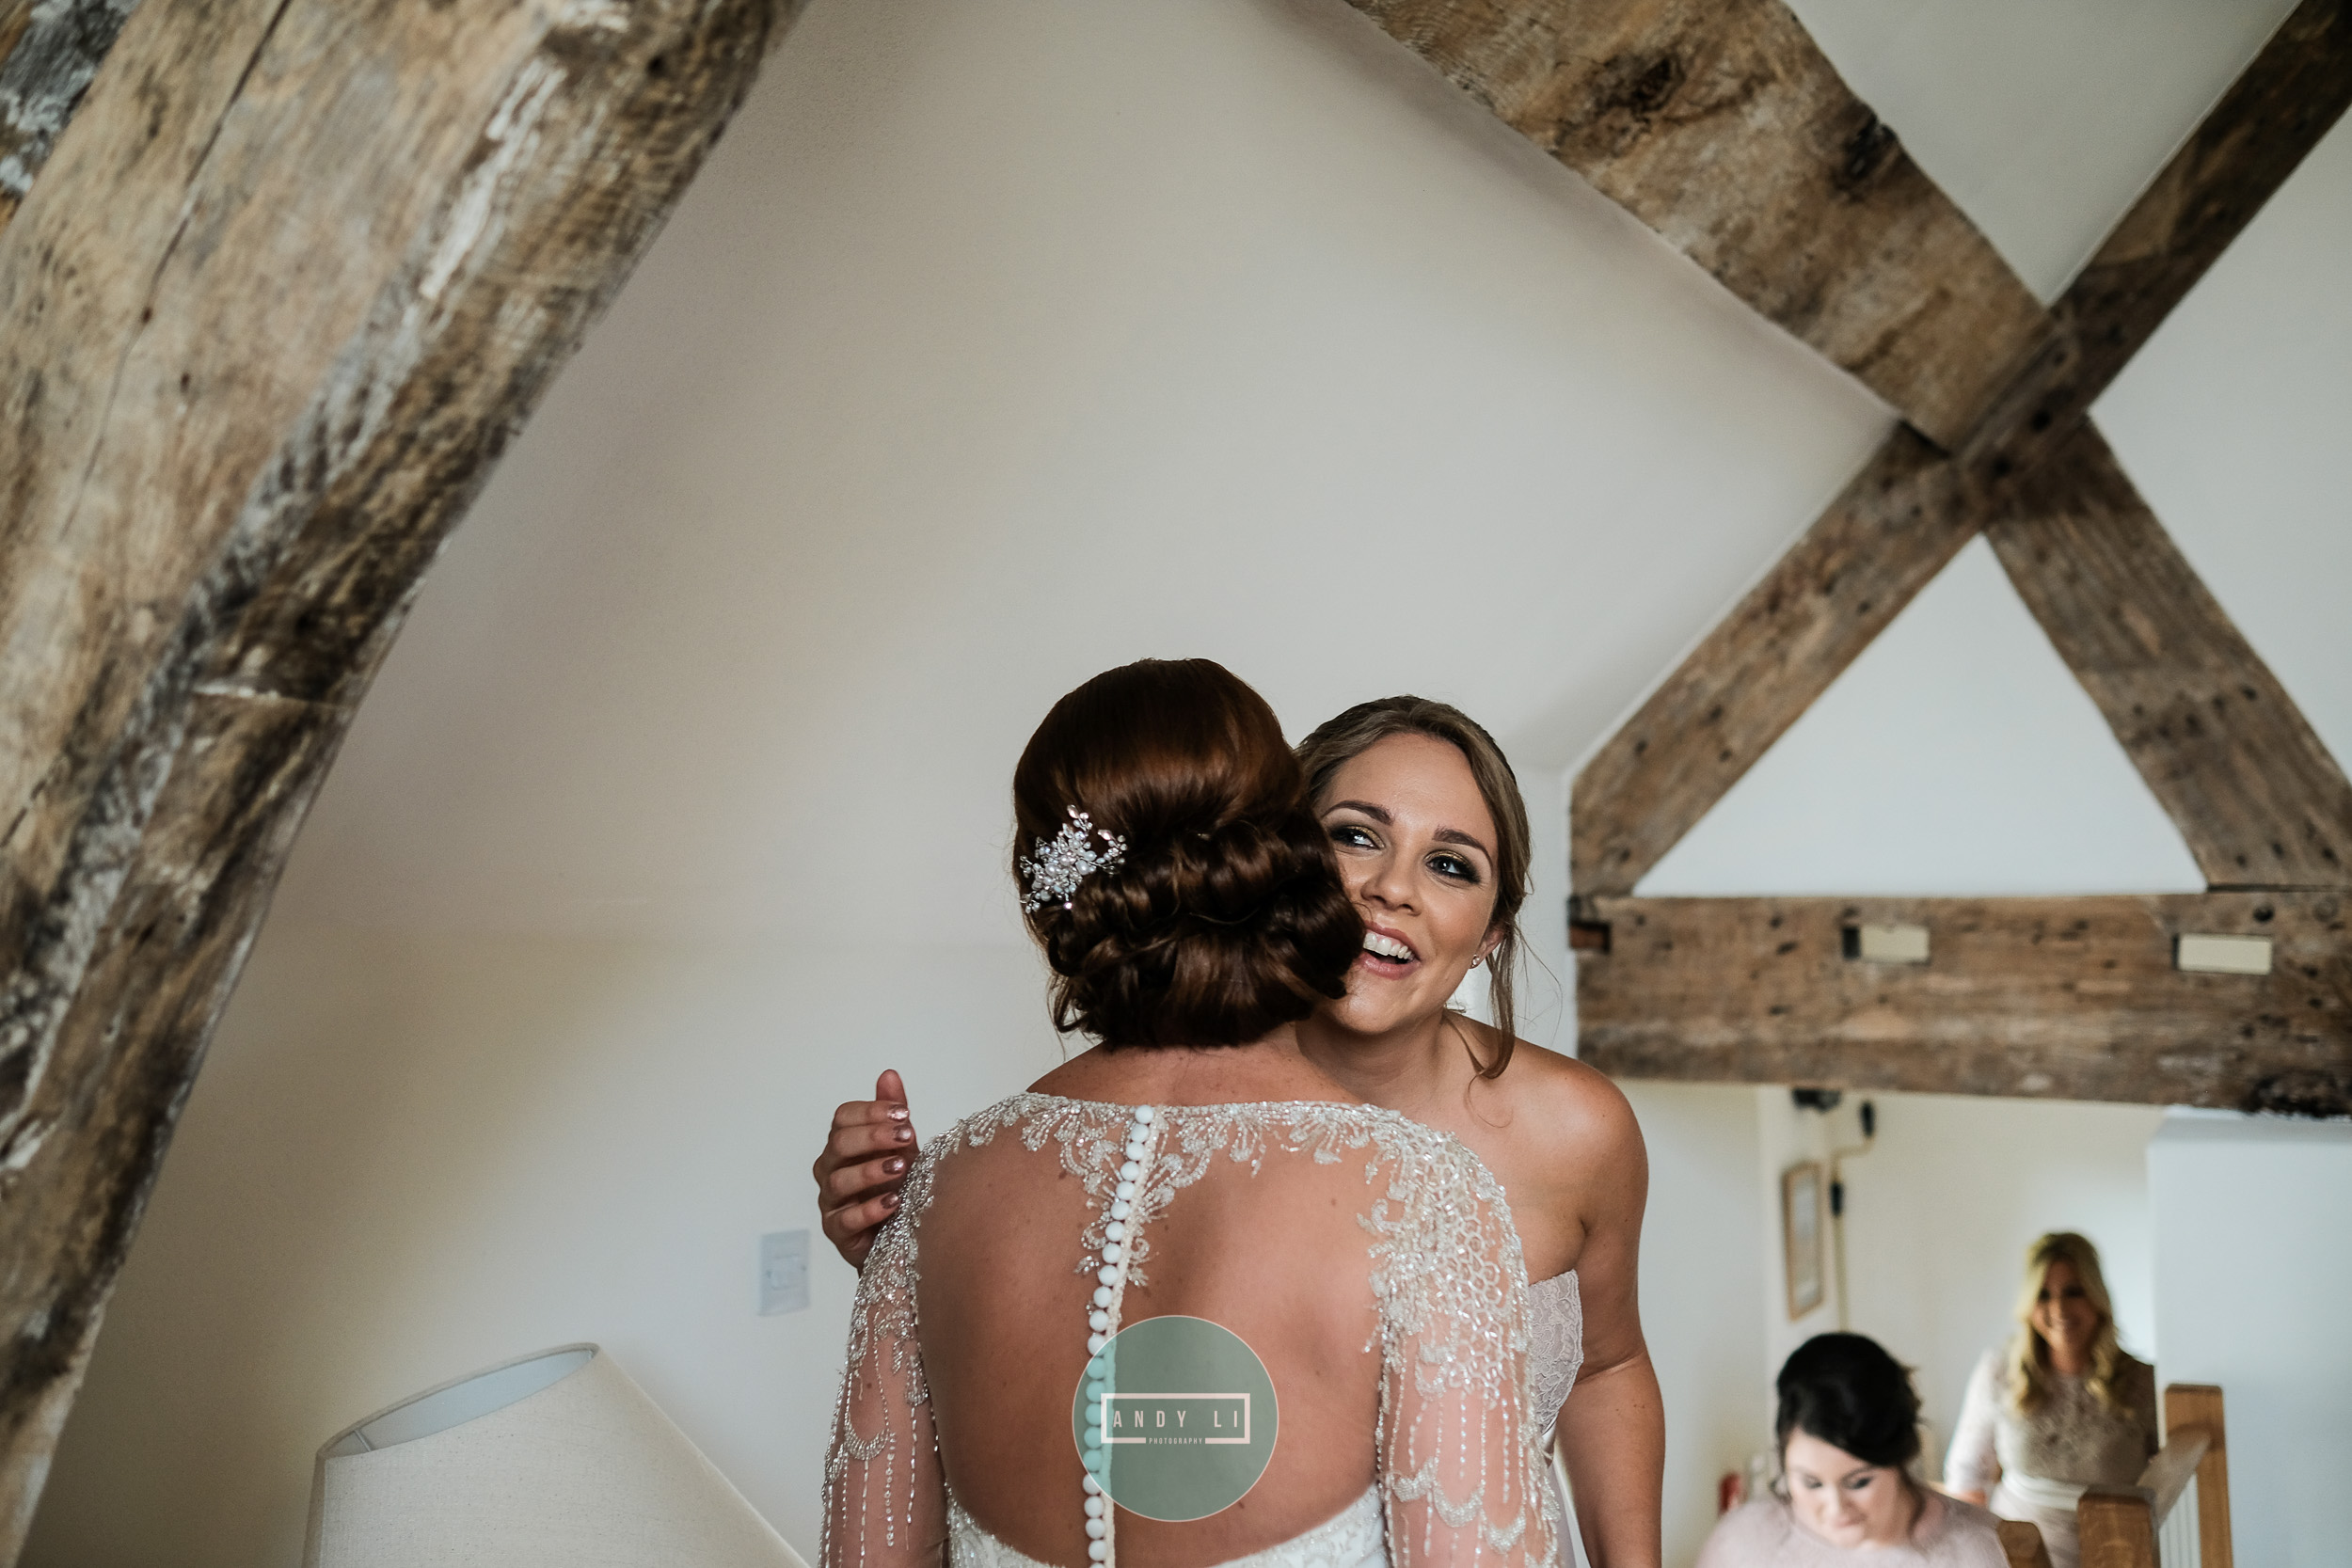 Pimhill Barn Wedding Photographer-033-DSCF9905.jpg